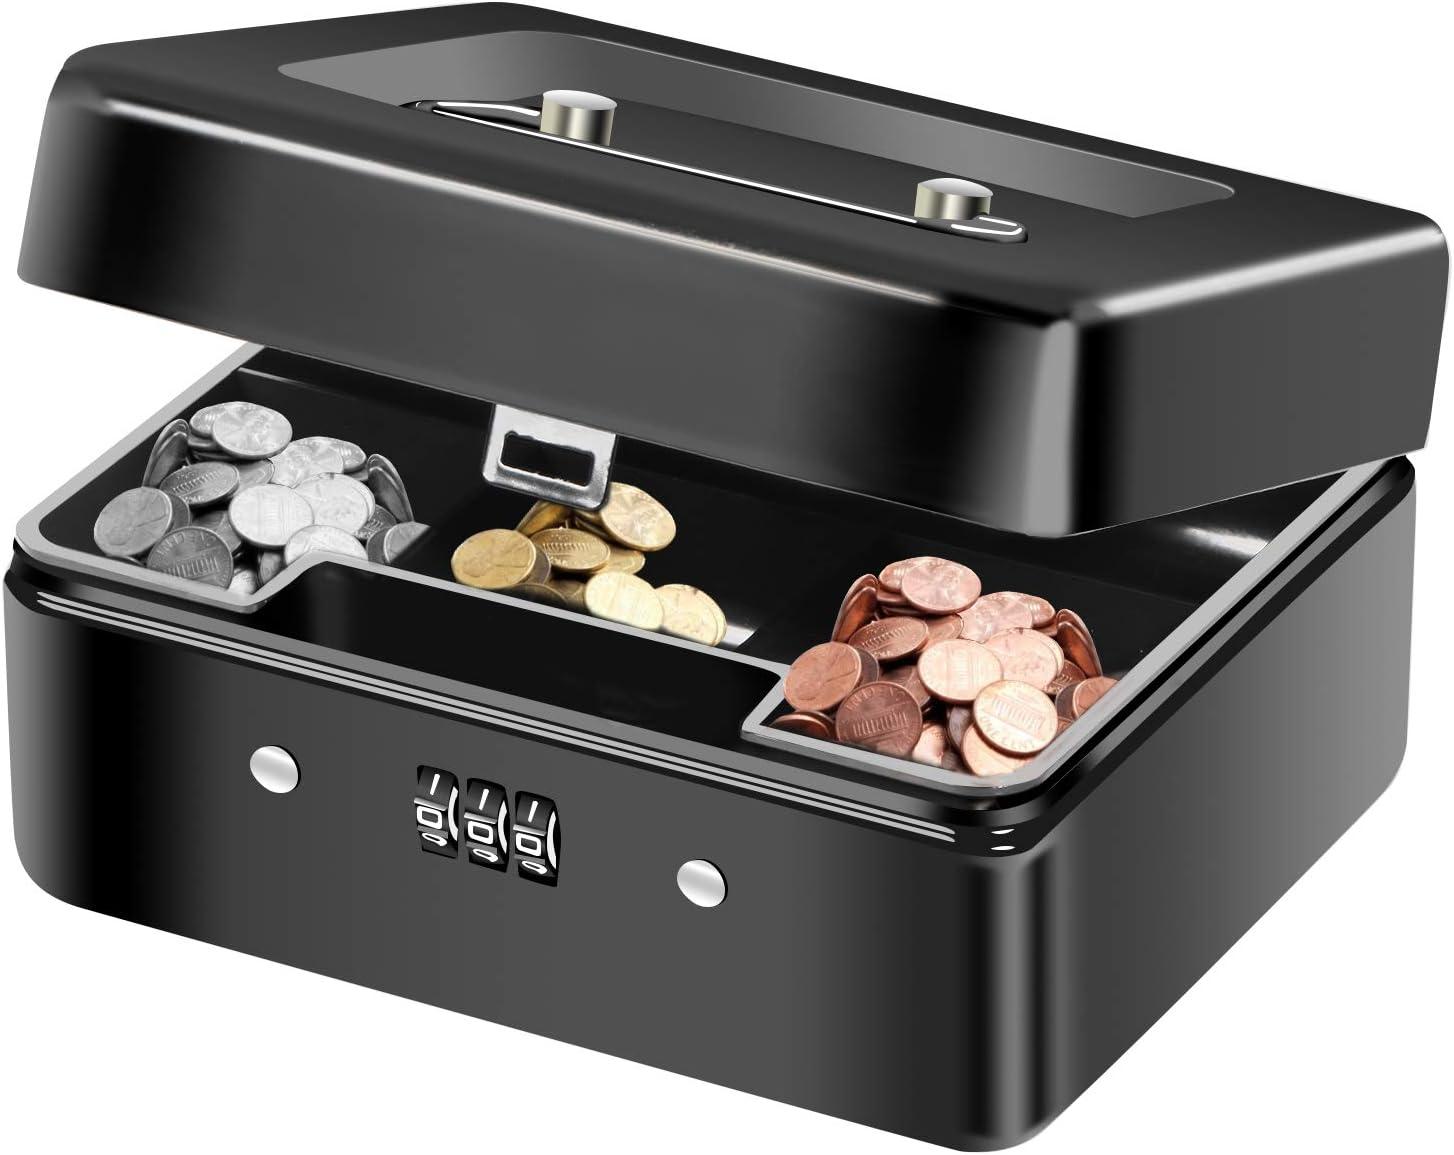 Caja Fuerte Portátil, Diyife Pequeña Caja para Dinero con Portamonedas Interior para Monedas, Billetes, Cheques, Monedas, Joyas, Medicamentos (Negro)